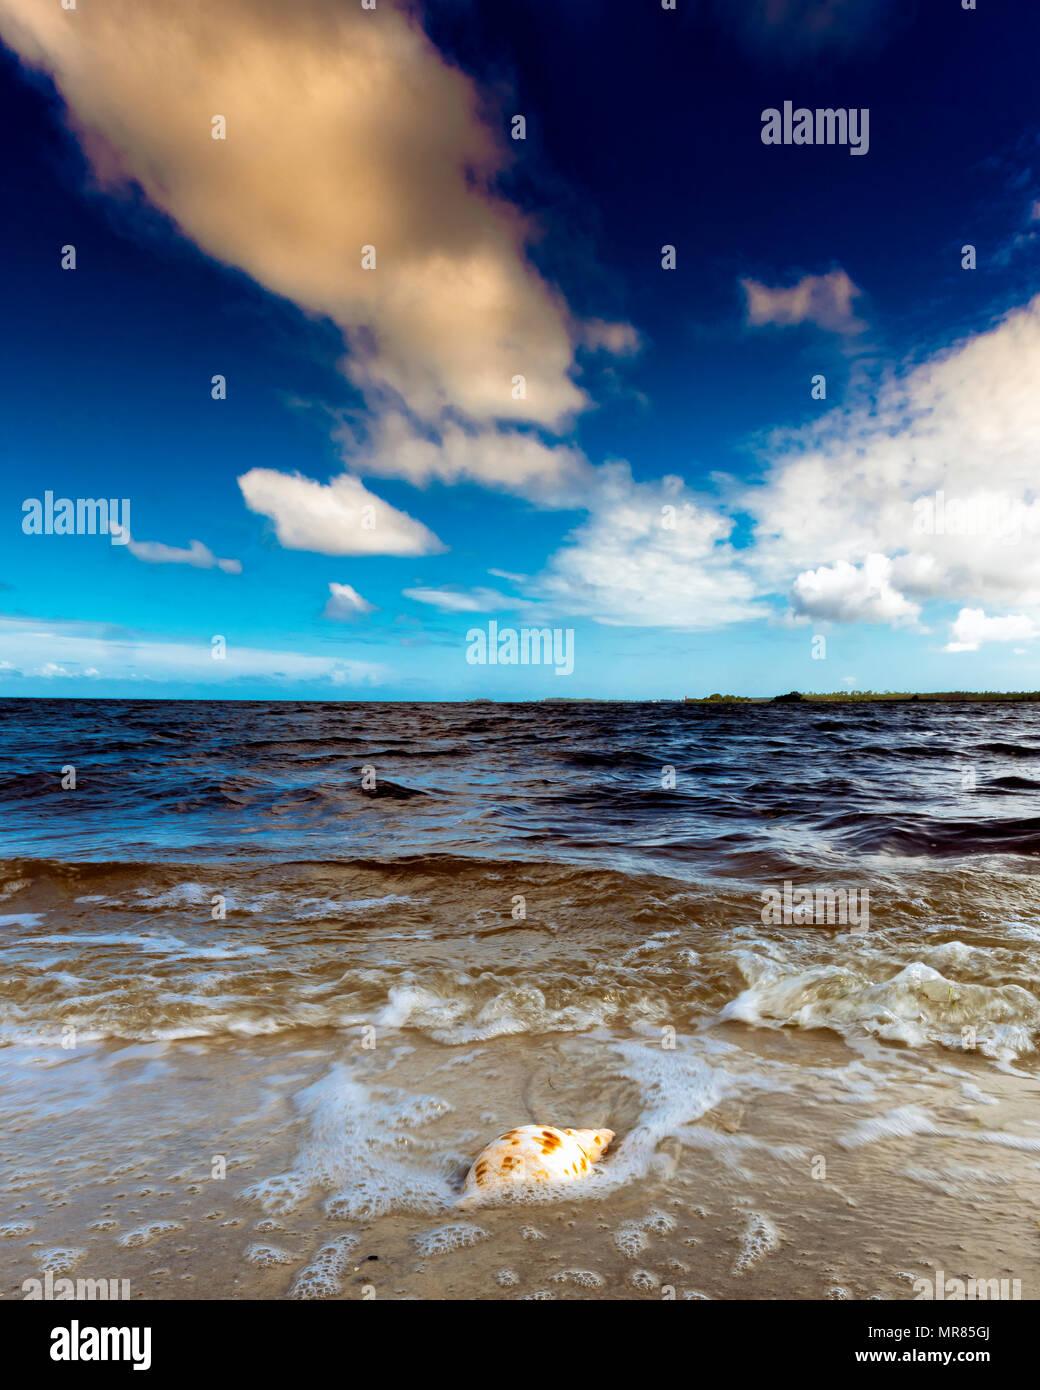 Alone On the Beach Stock Photo